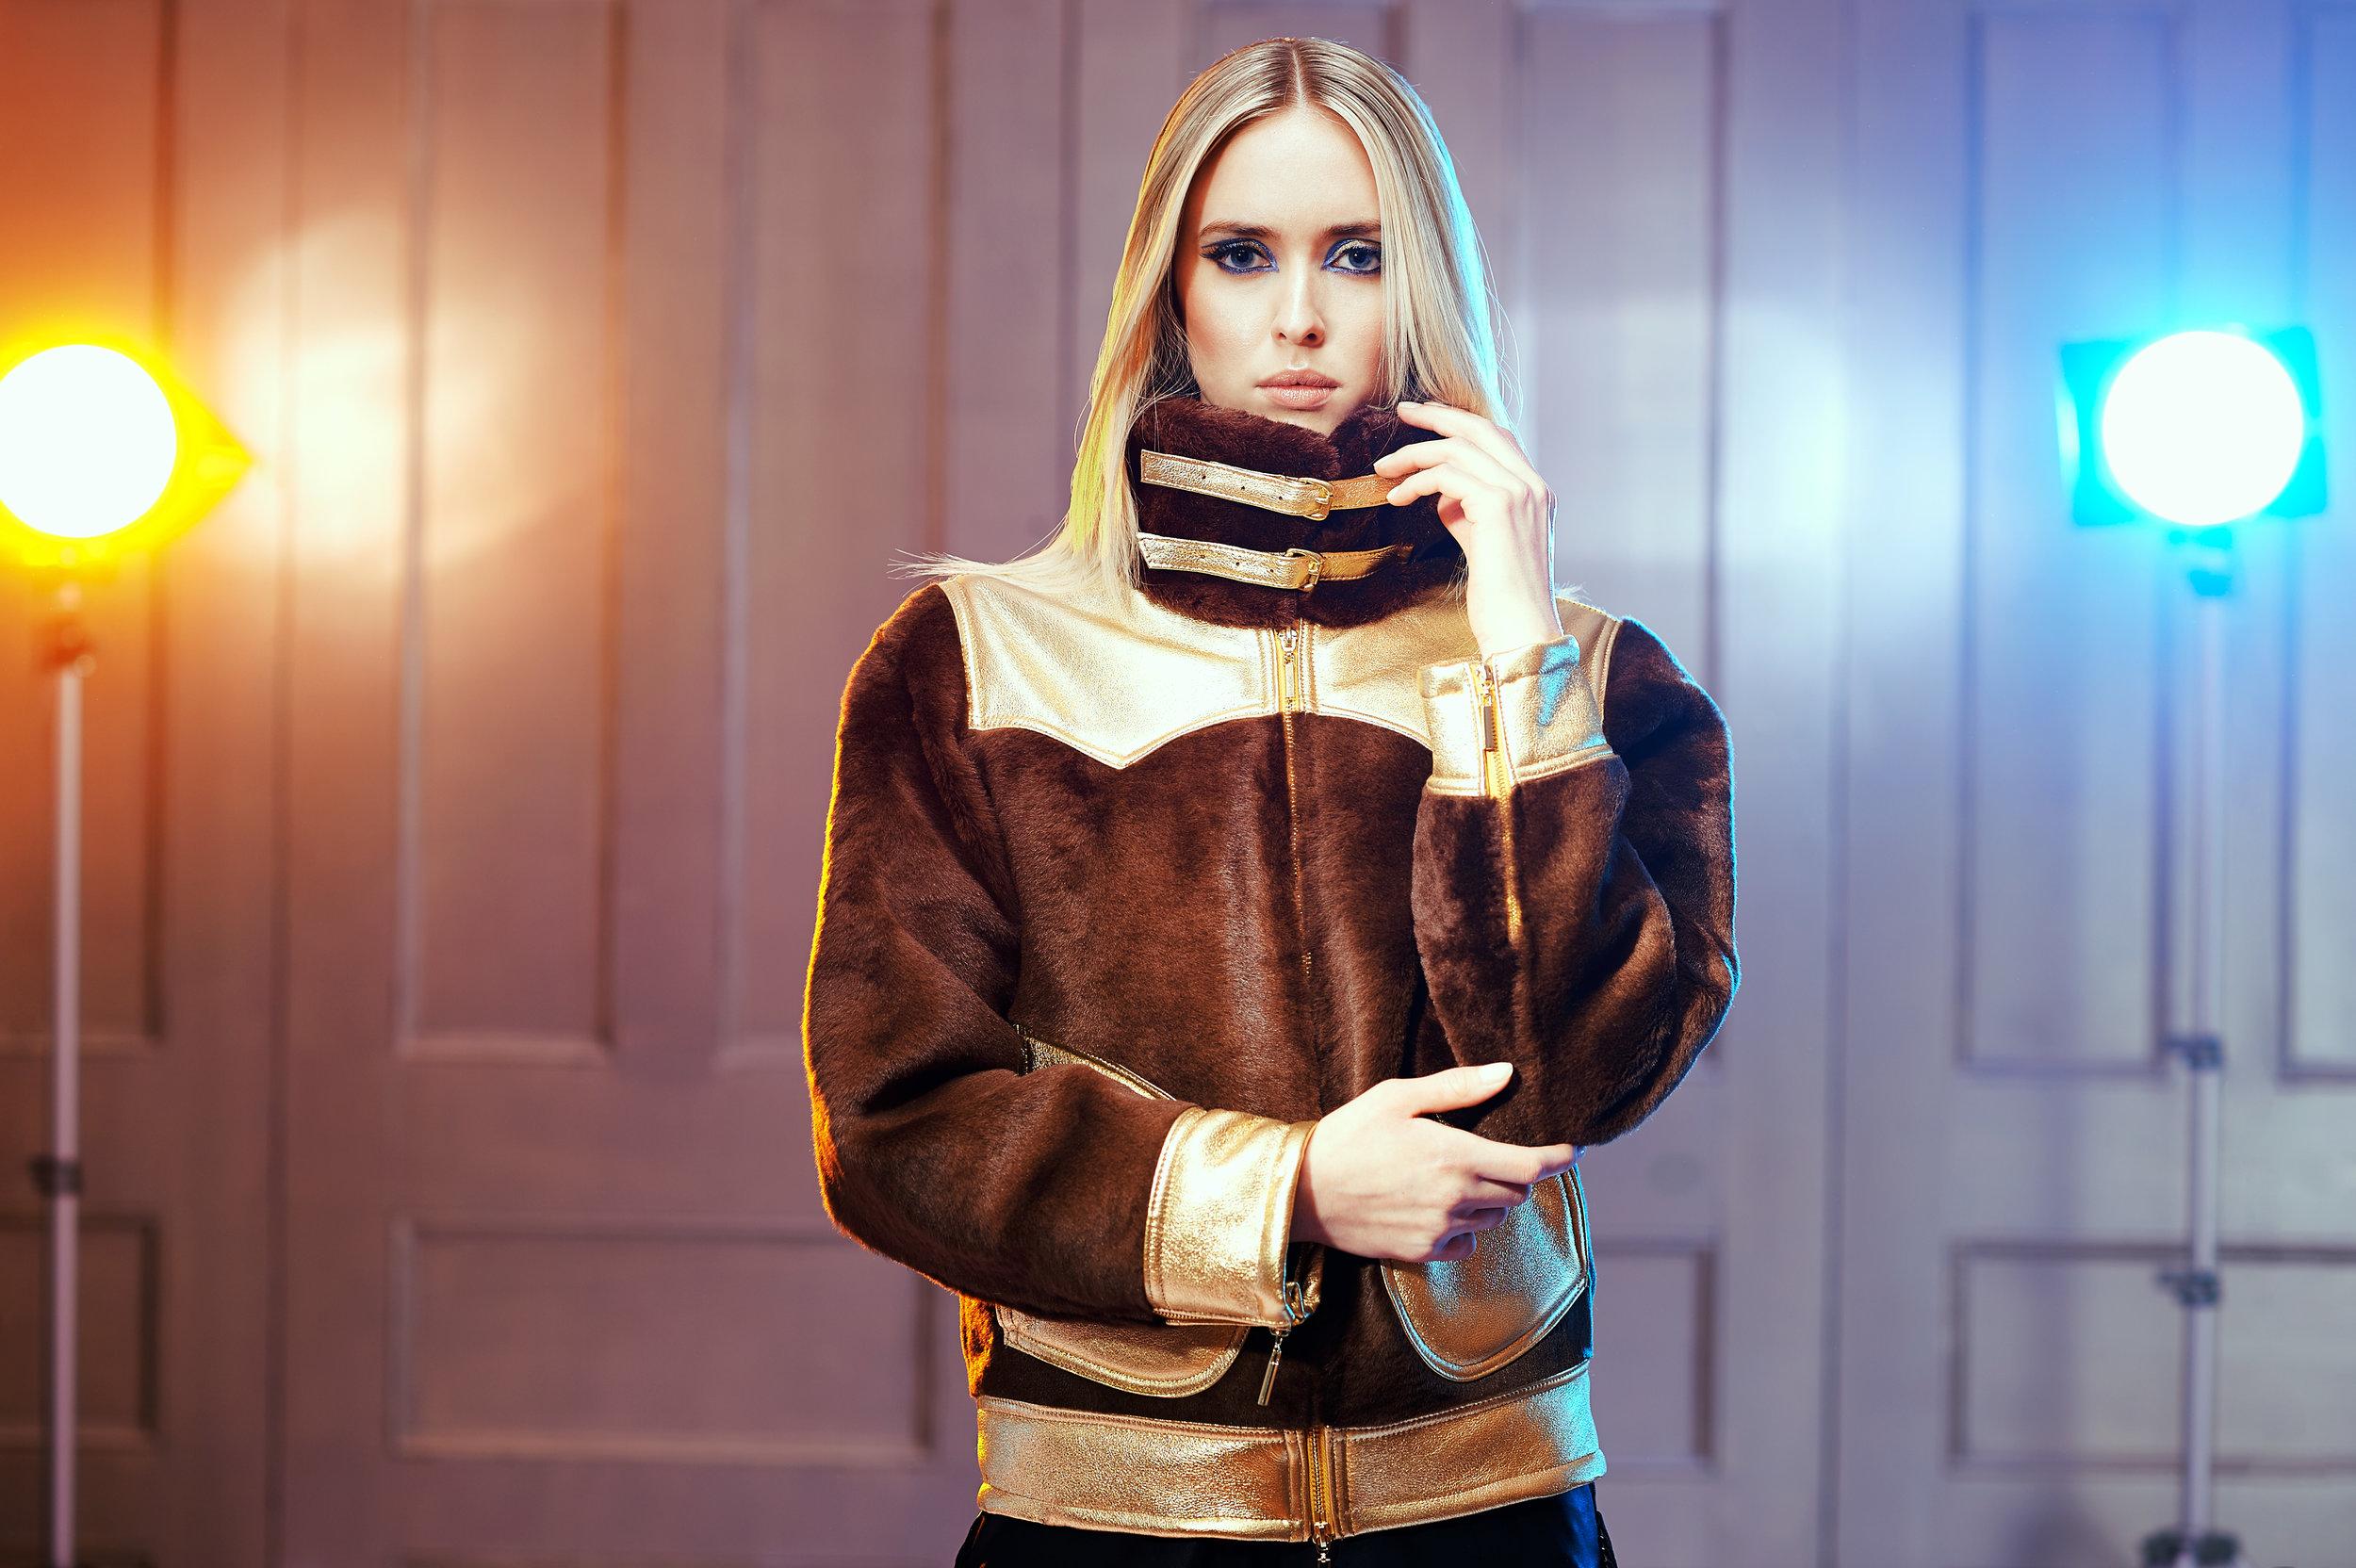 Marta-Hewson-Angela-DeMontigny-LookBook-FW18-collection-49703.jpg